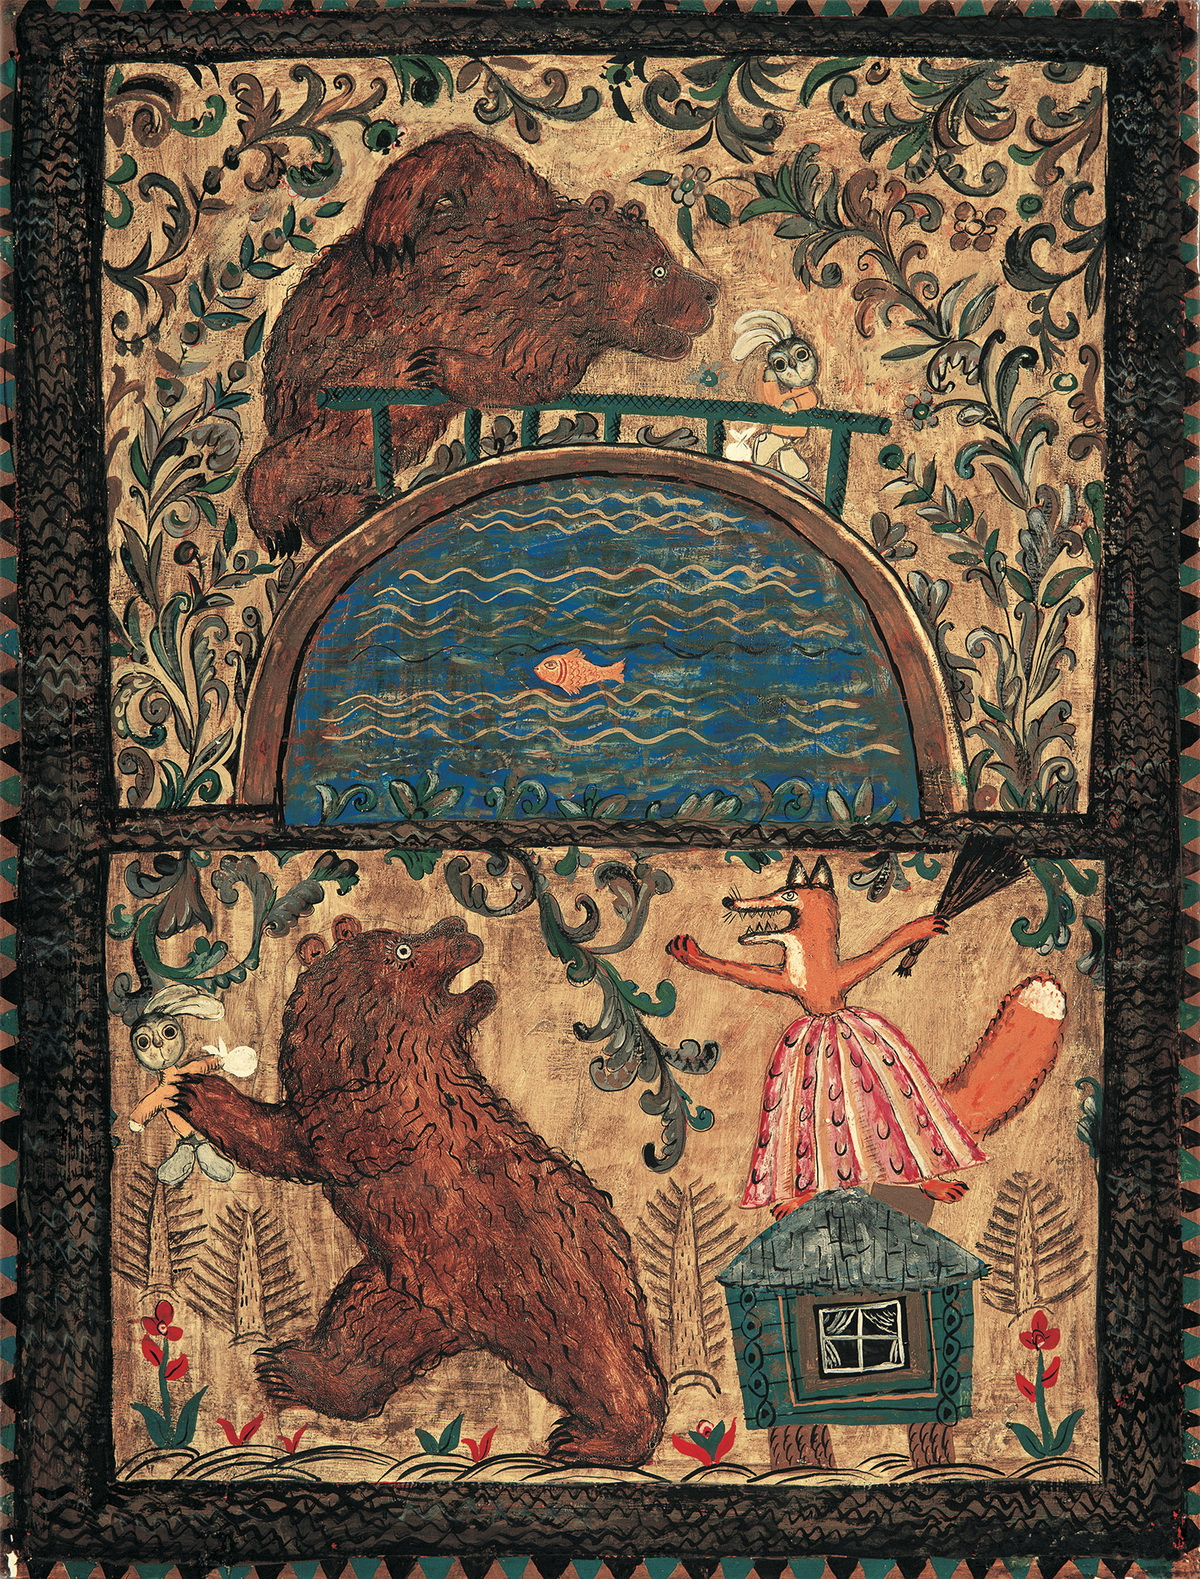 Юрий Норштейн, Франческа Ярбусова, «Медведь и заяц» Смешанная техника. К эпизоду из фильма «Лиса и заяц»